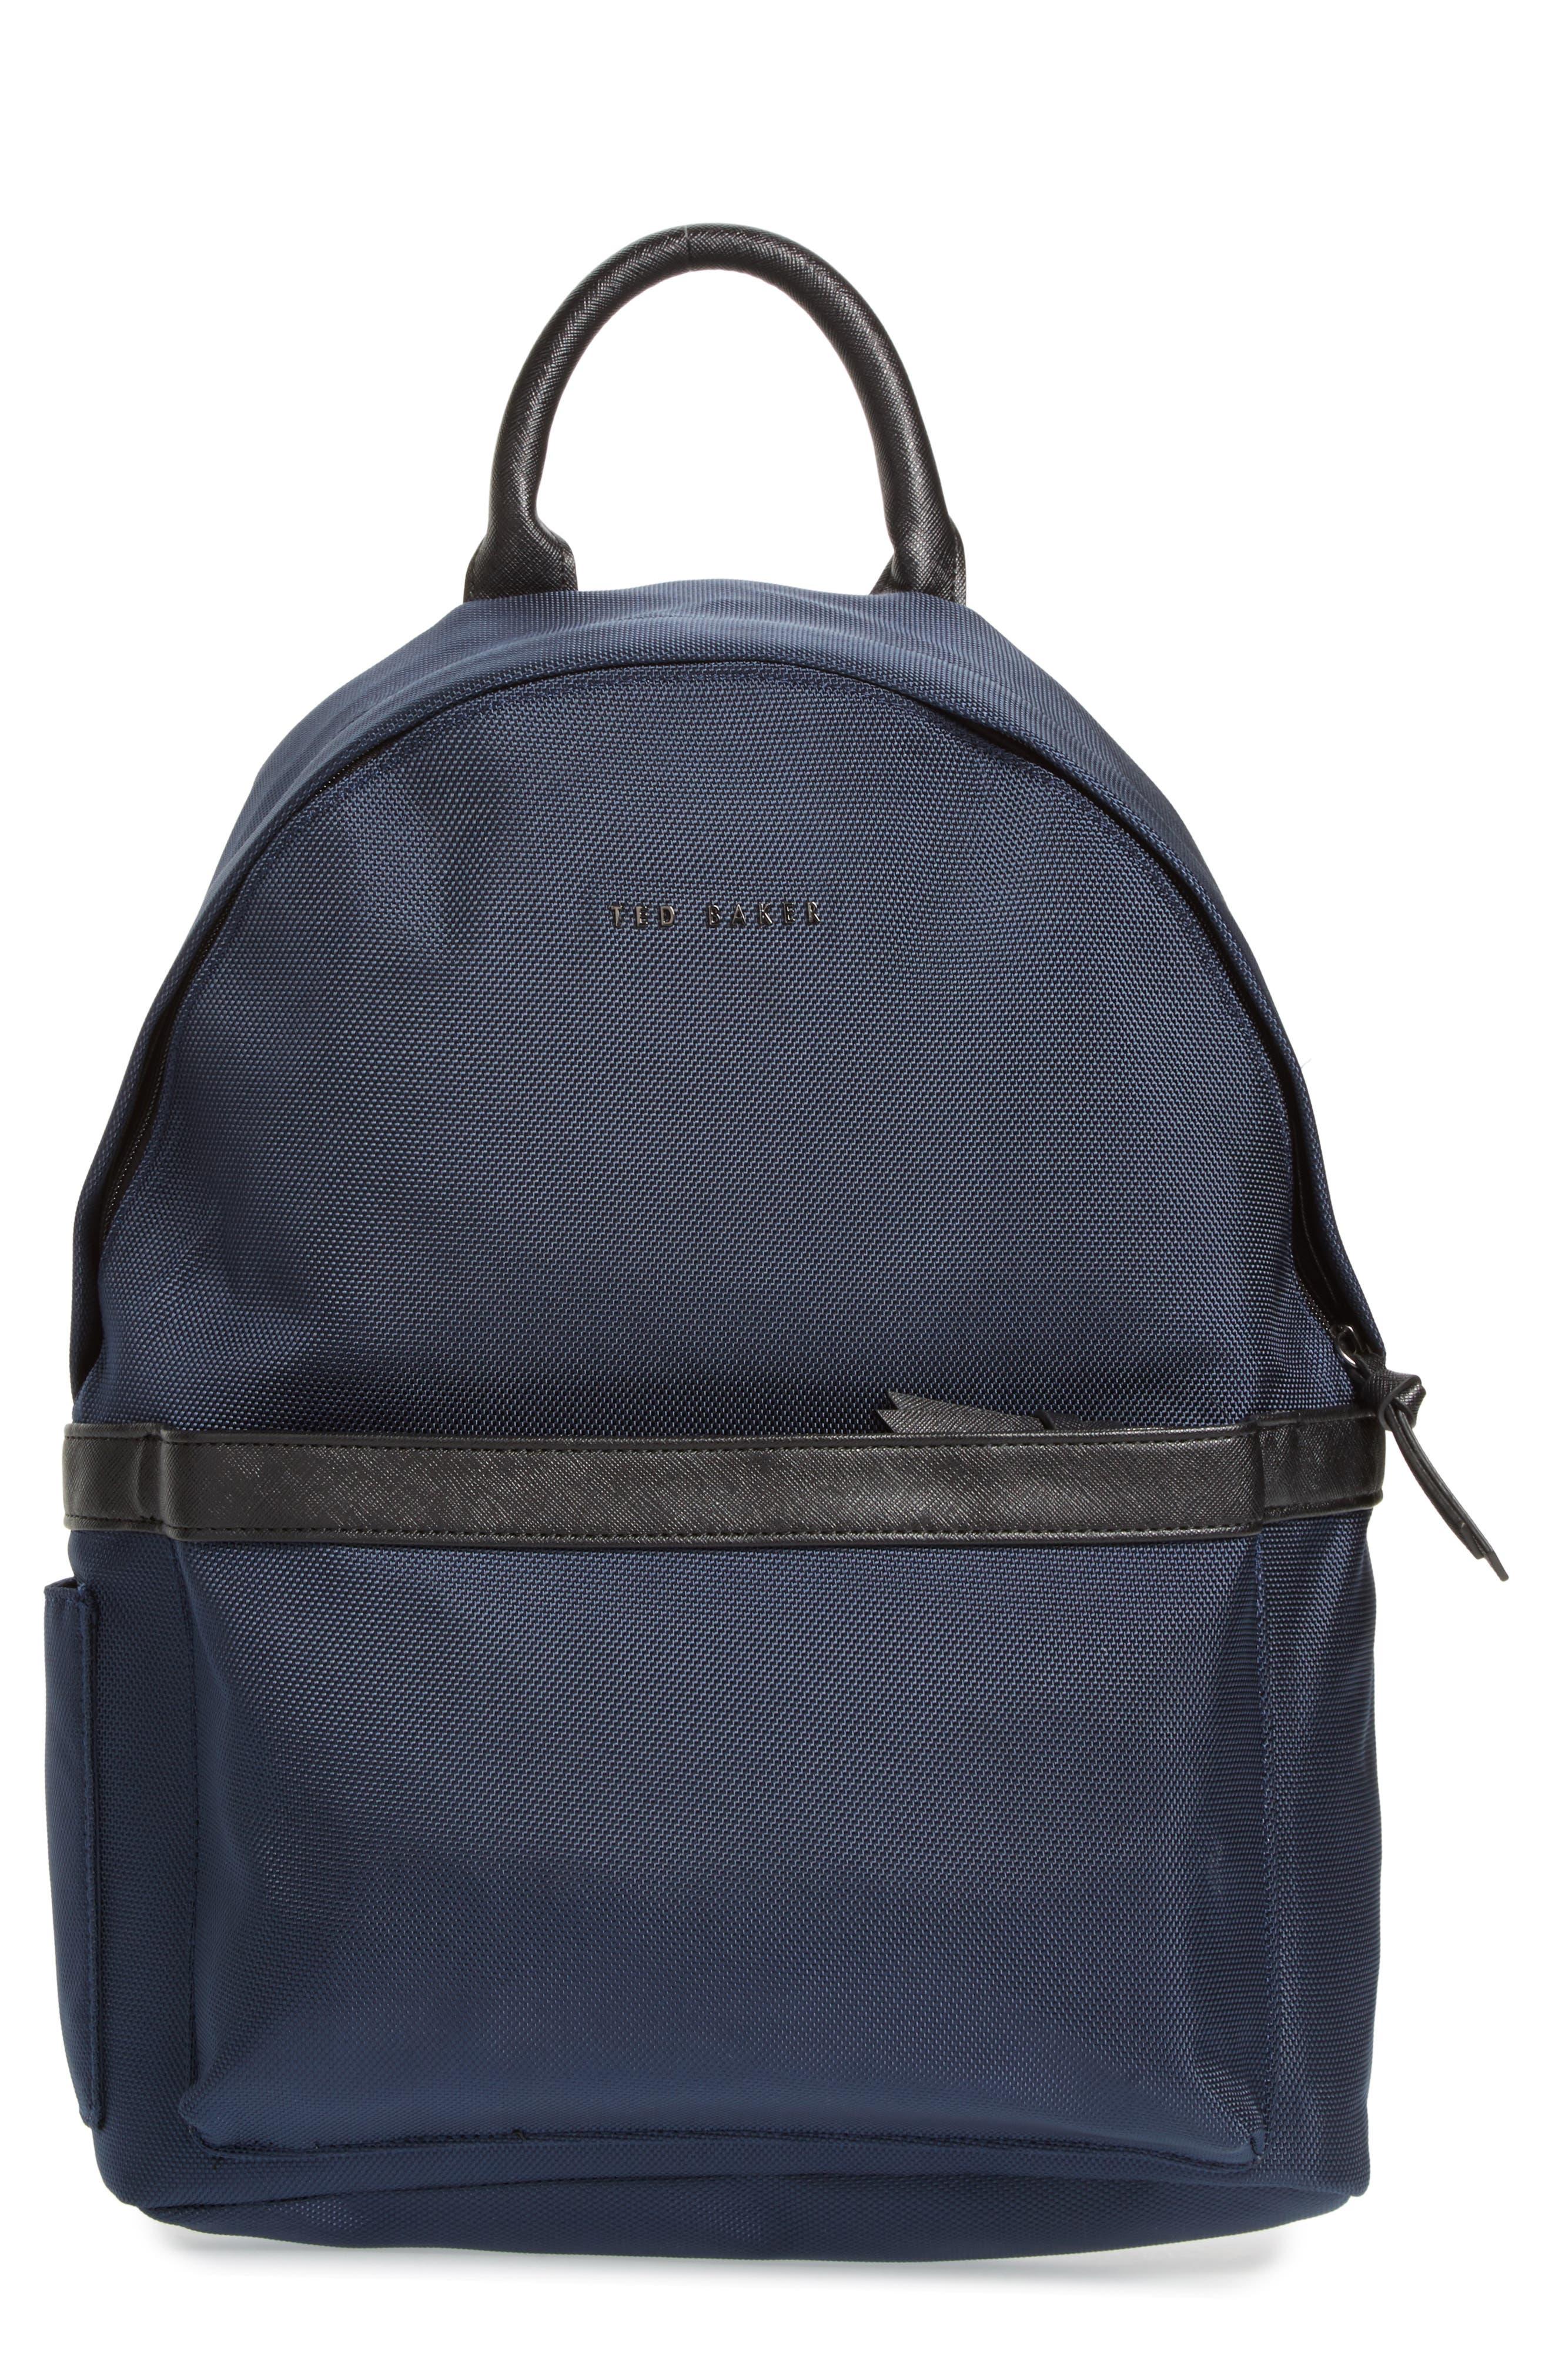 Radio Backpack,                         Main,                         color, Navy